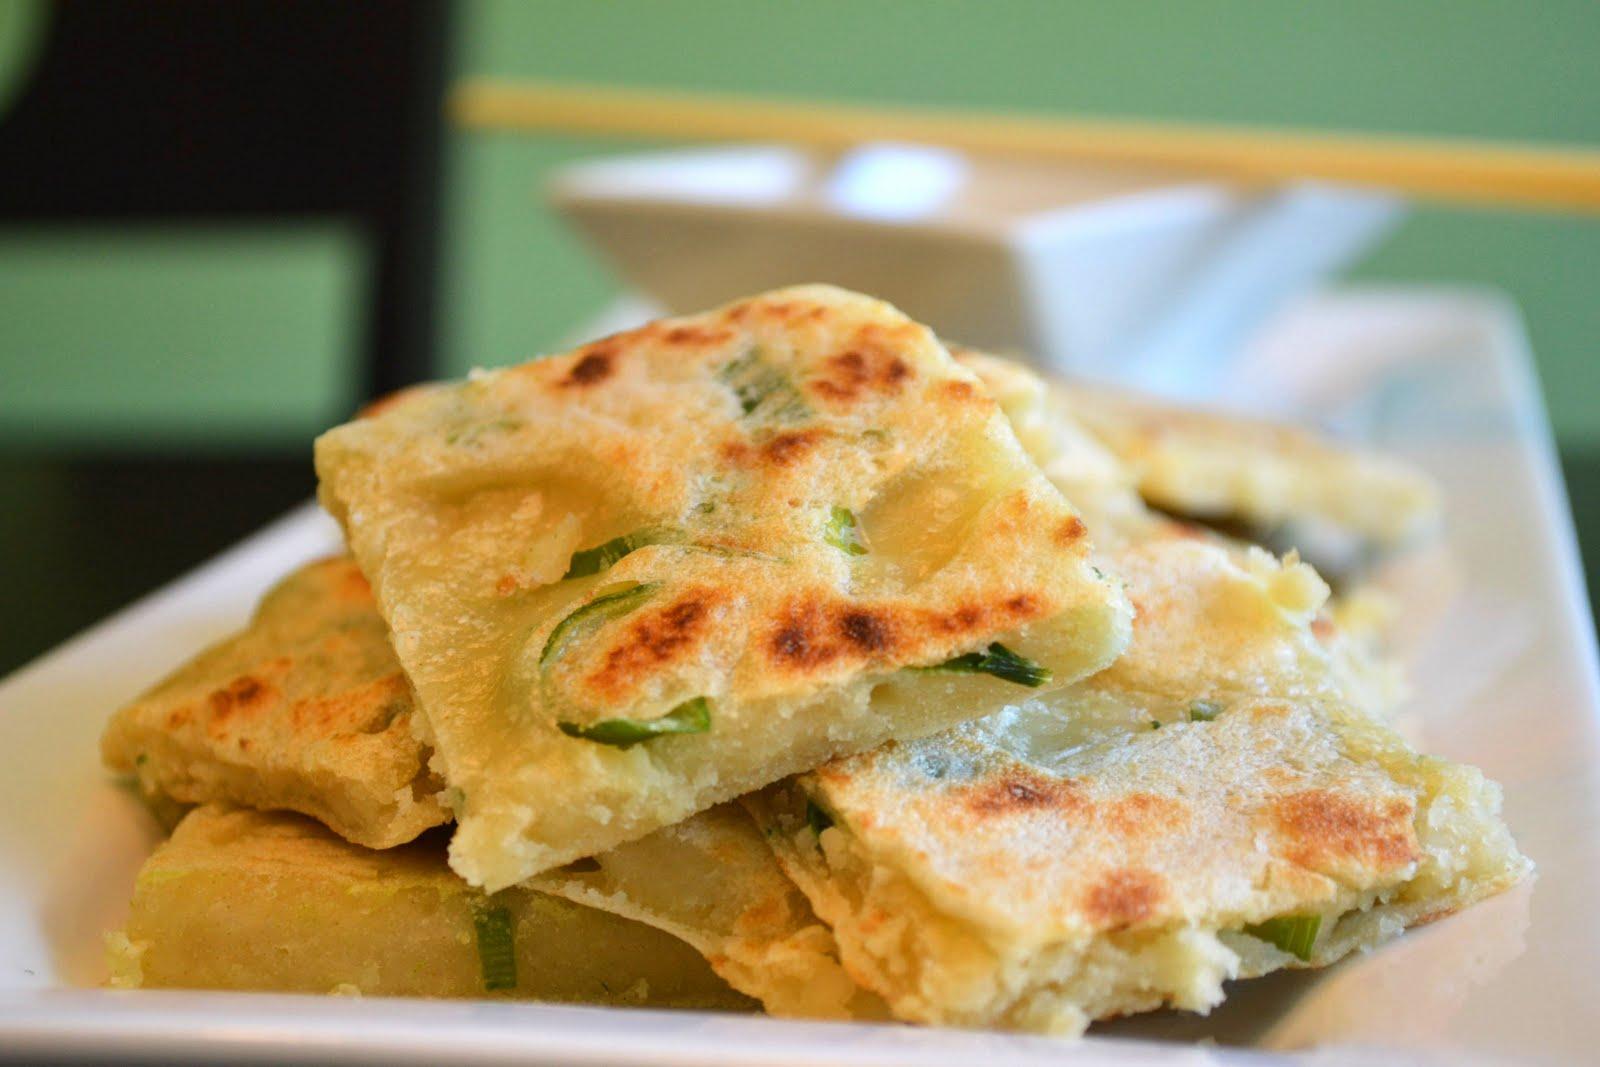 Just Putzing Around the Kitchen: Scallion Pancakes (Cong You Bing)